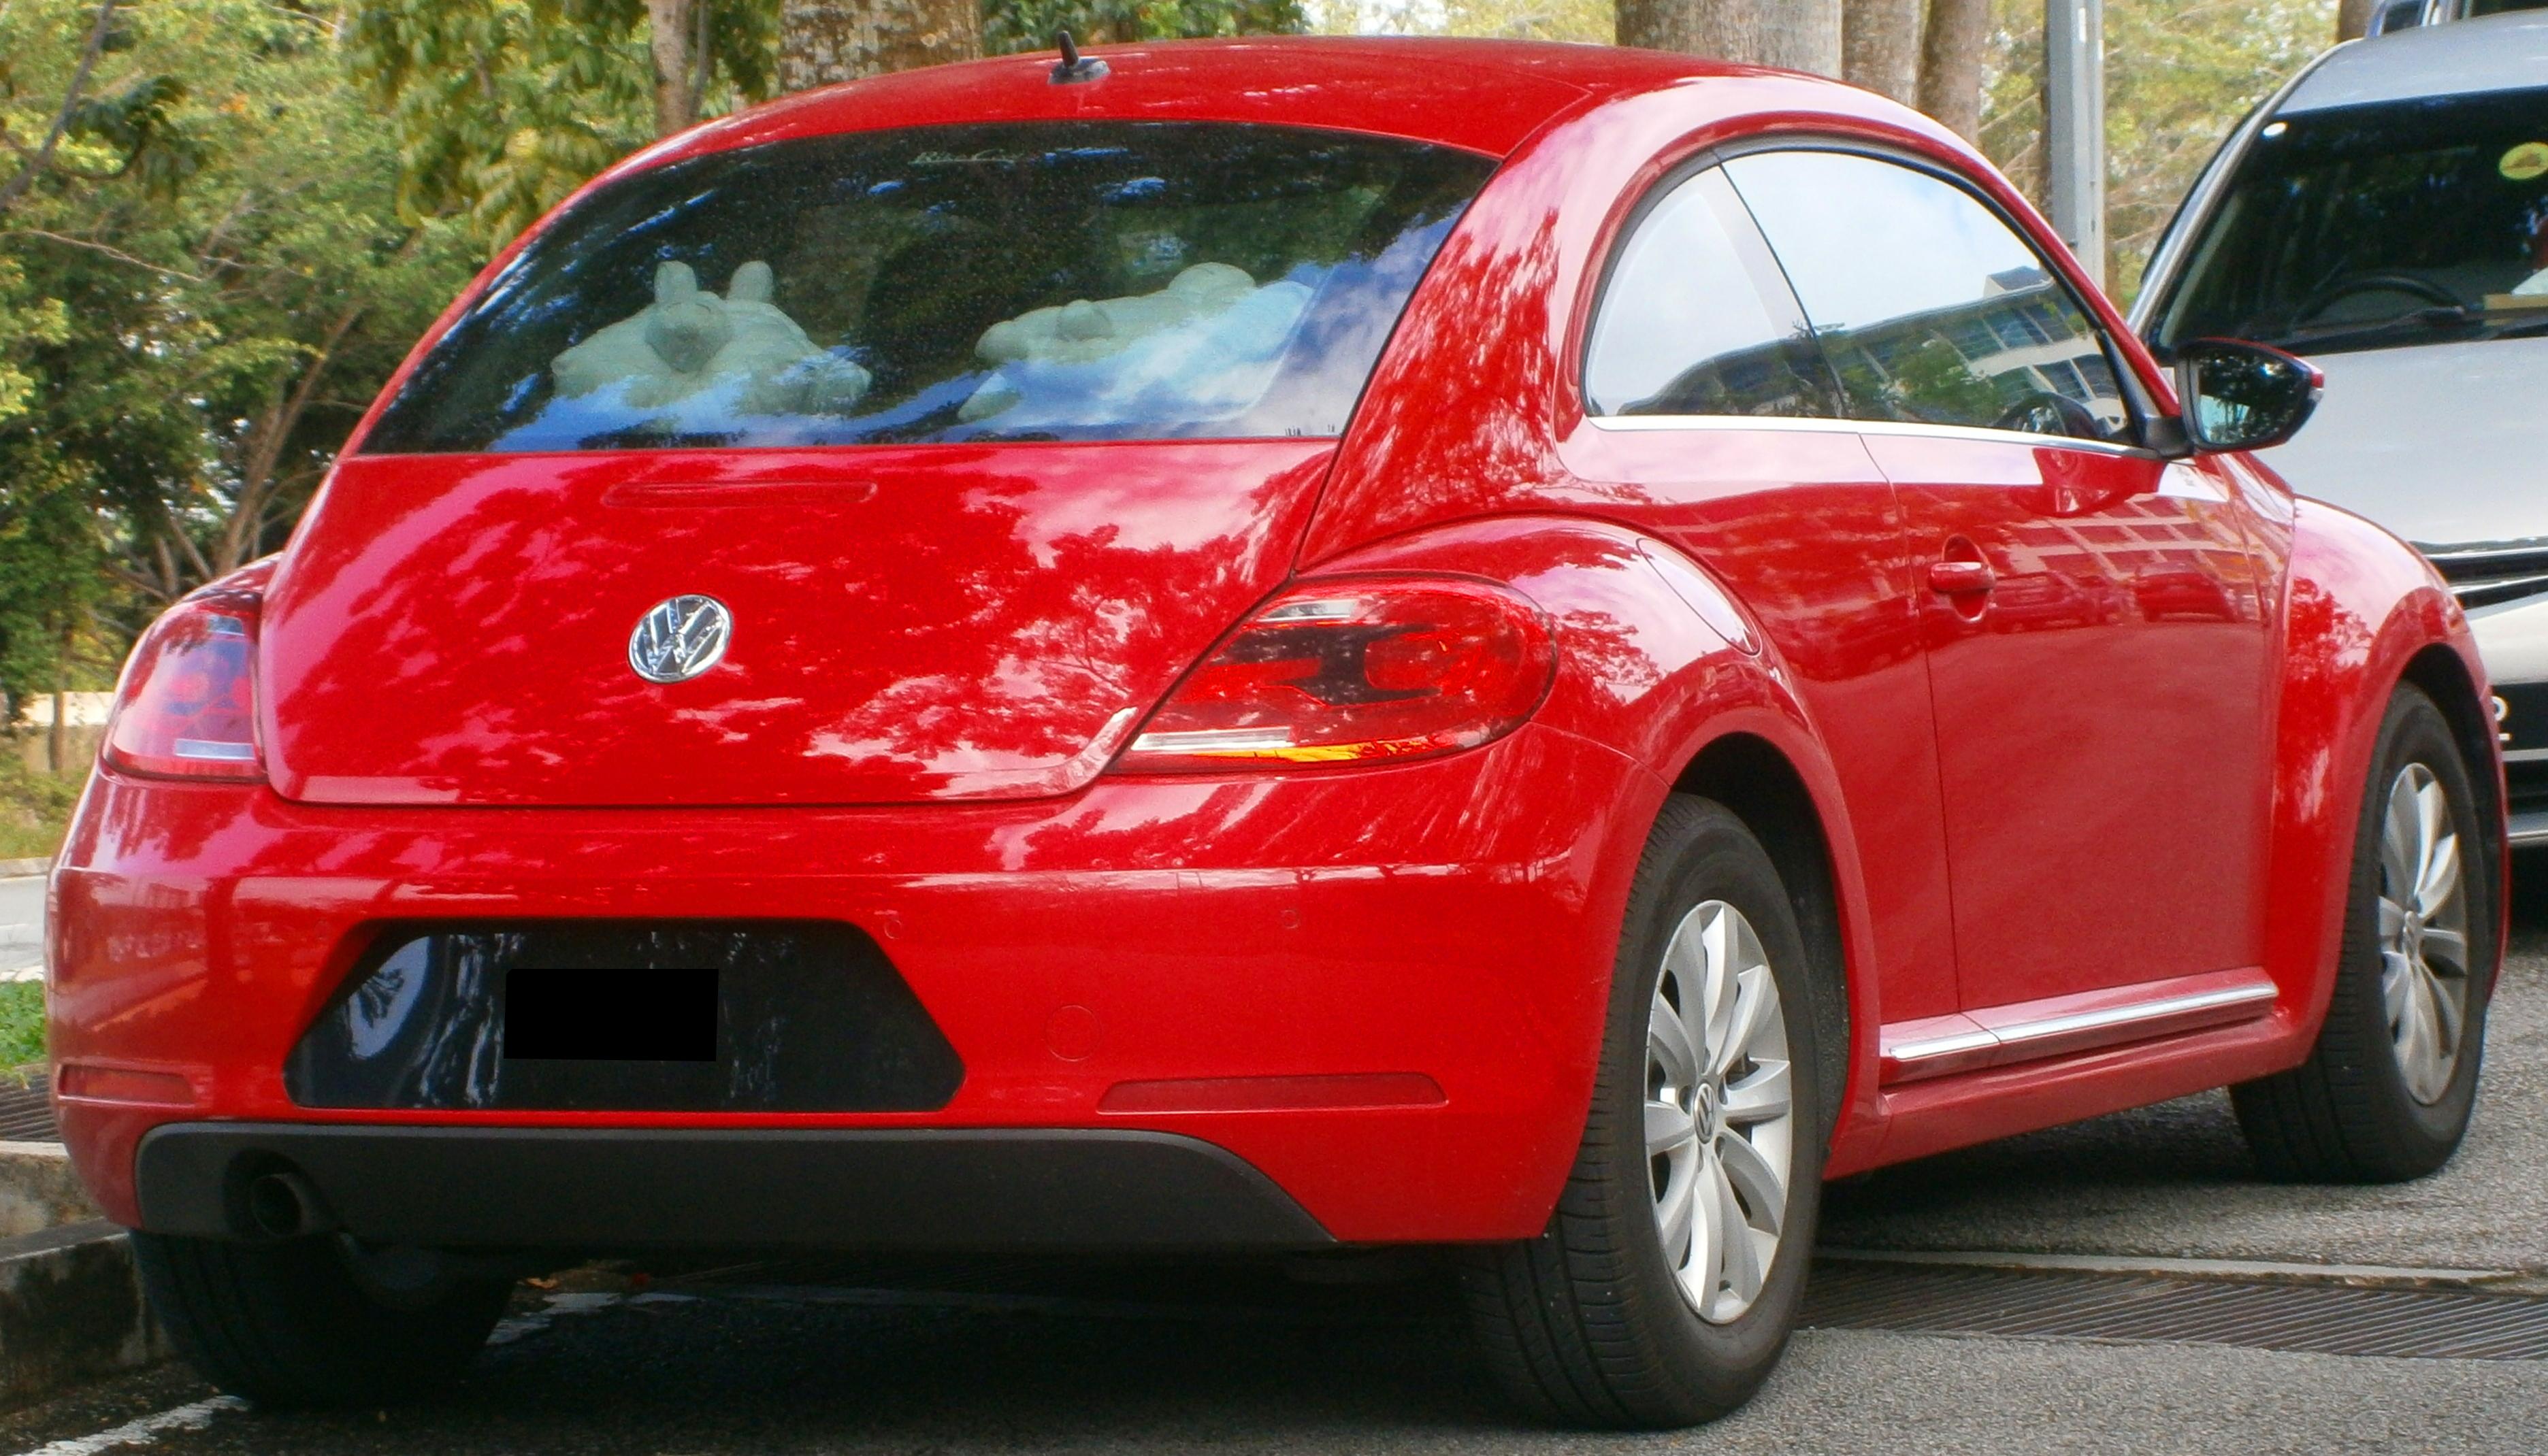 File:2012 Volkswagen Beetle 1.2 TSI in Cyberjaya, Malaysia (02).jpg - Wikimedia Commons